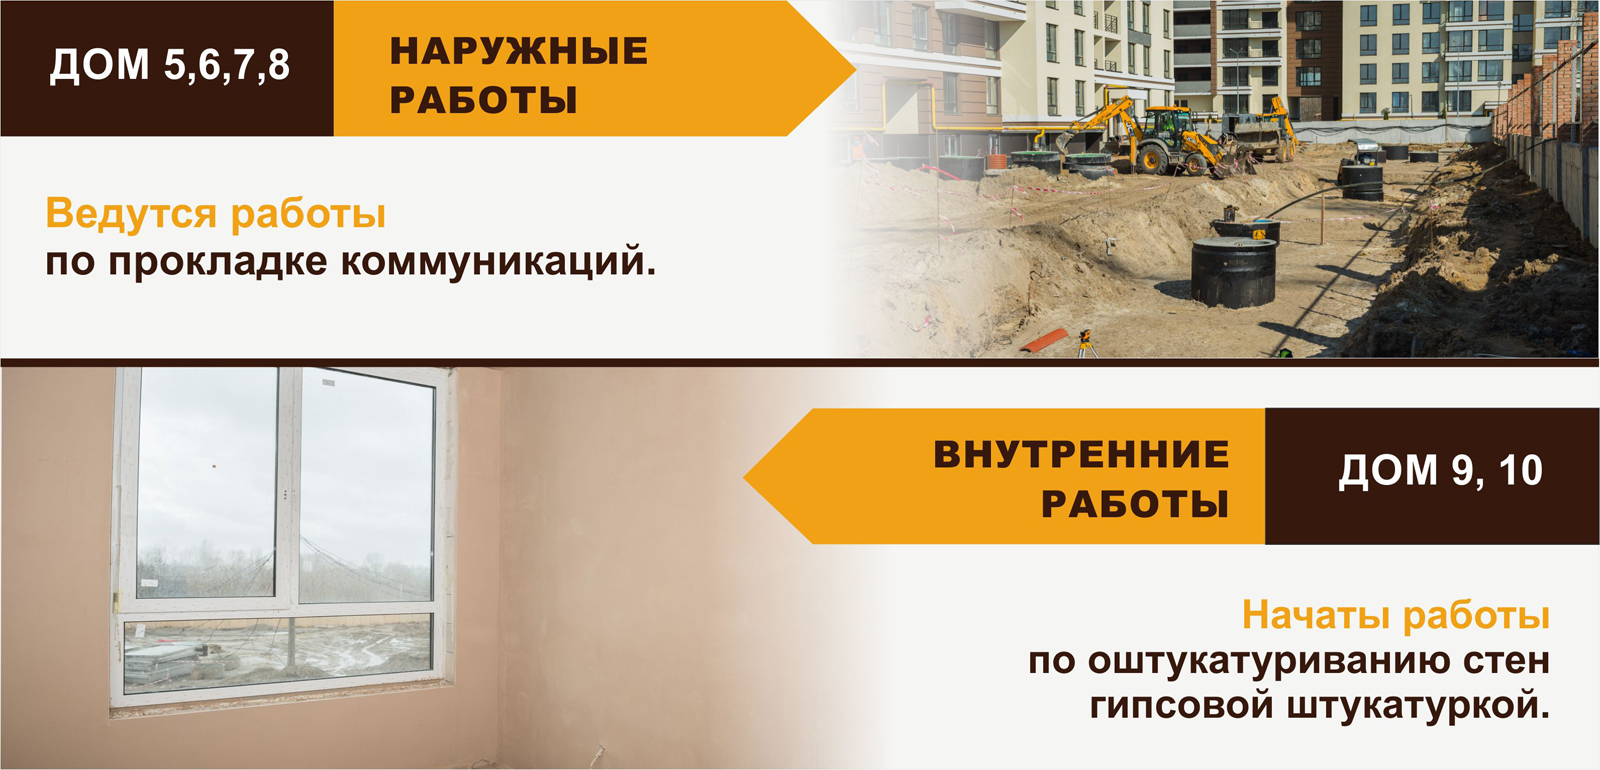 news_230317-ru